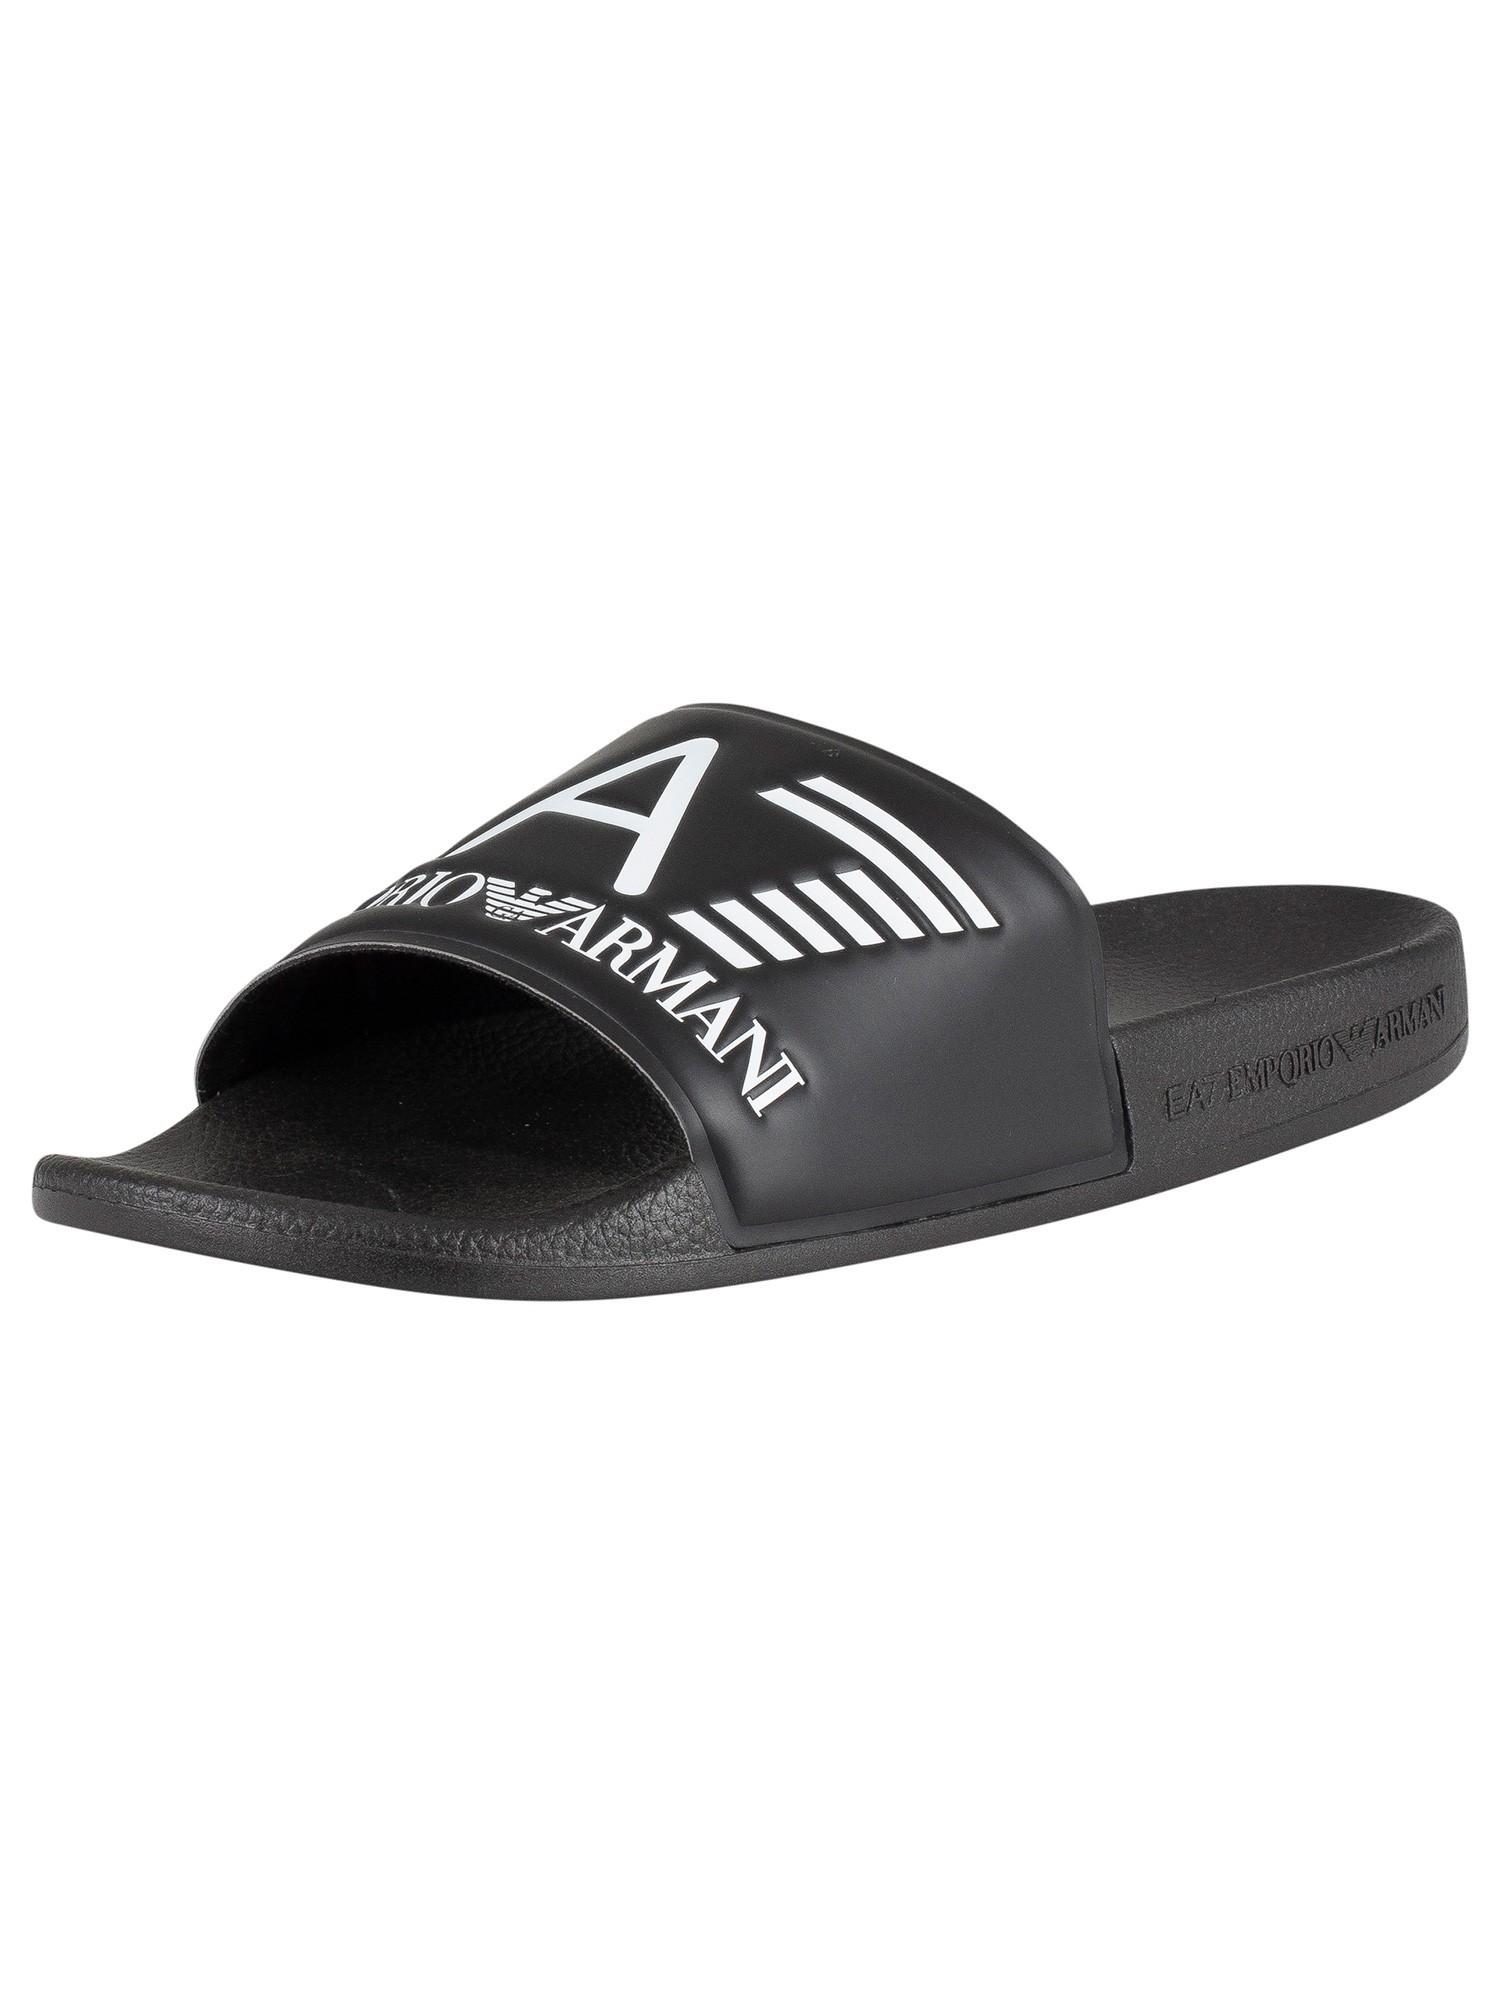 63db8c6db8d8 Men s Designer Flip Flops